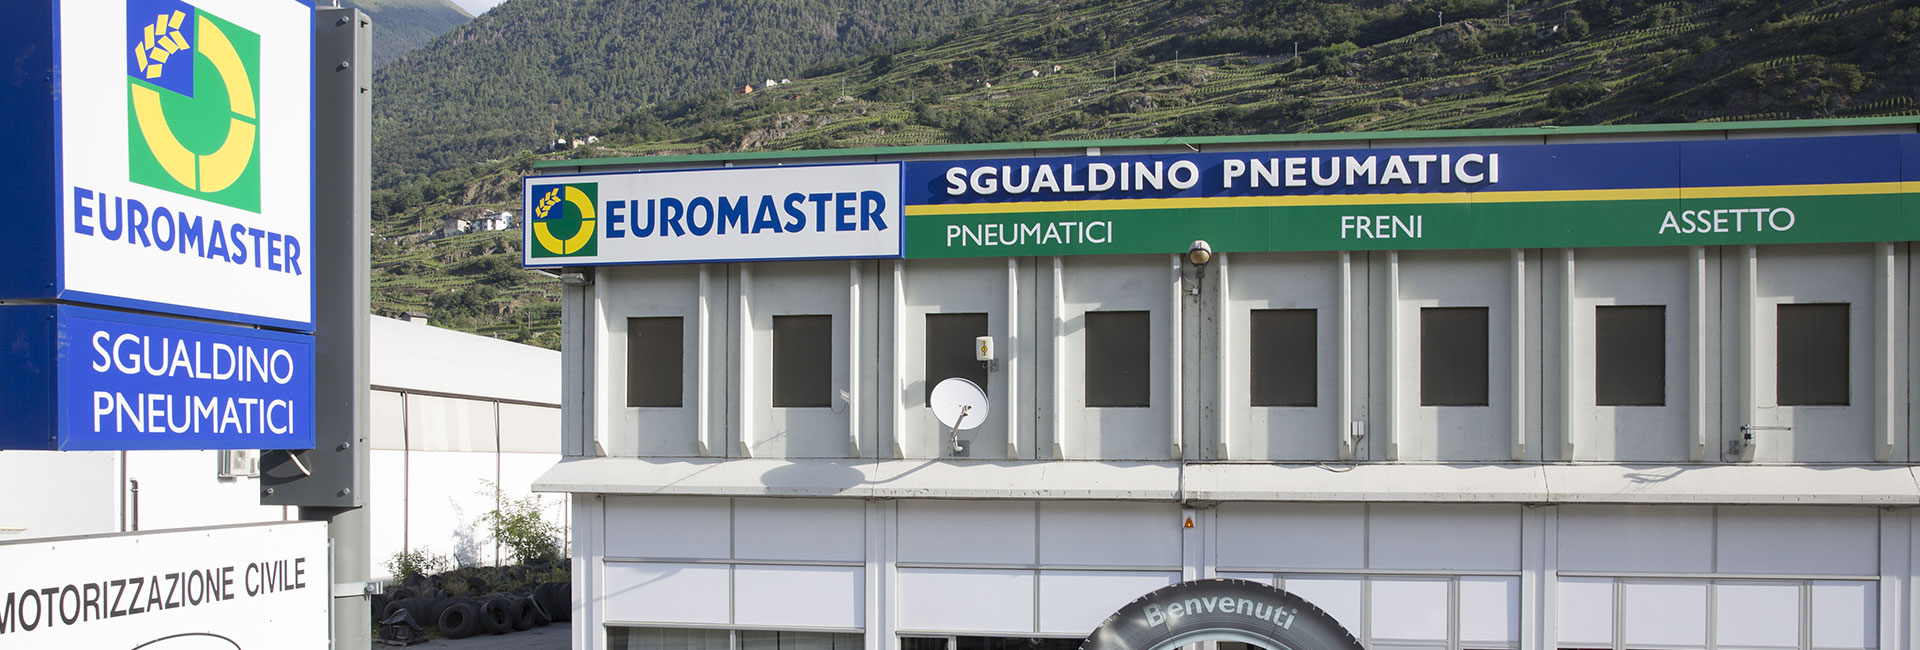 gommista euromaster Castione Sondri